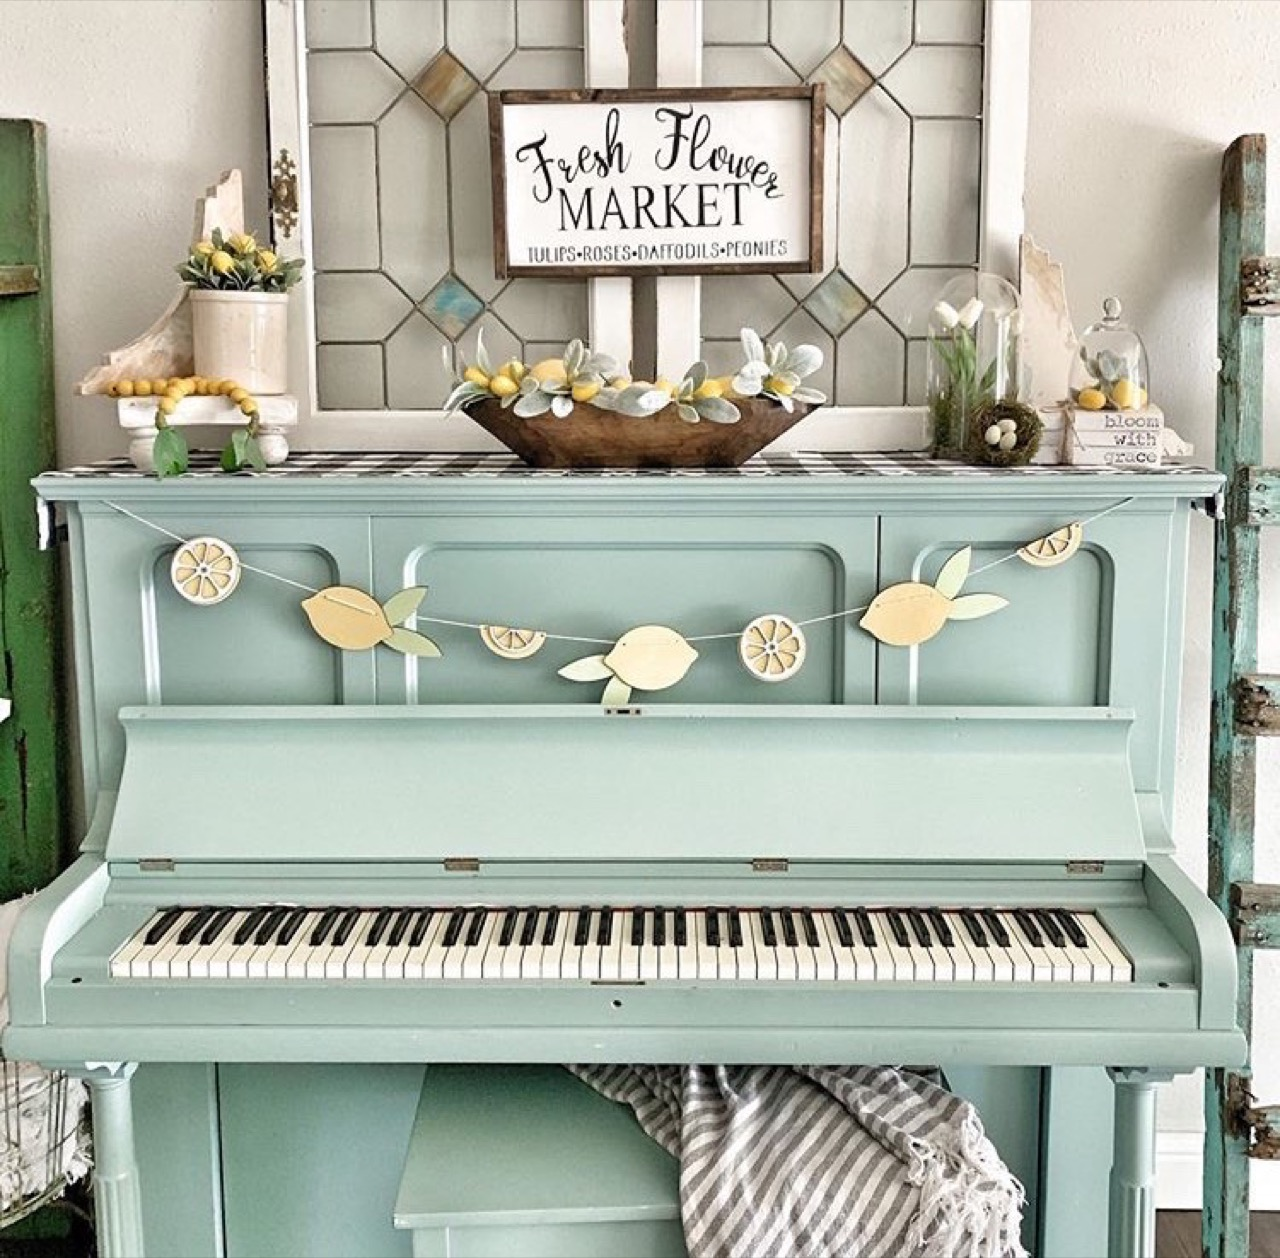 Teal piano decor